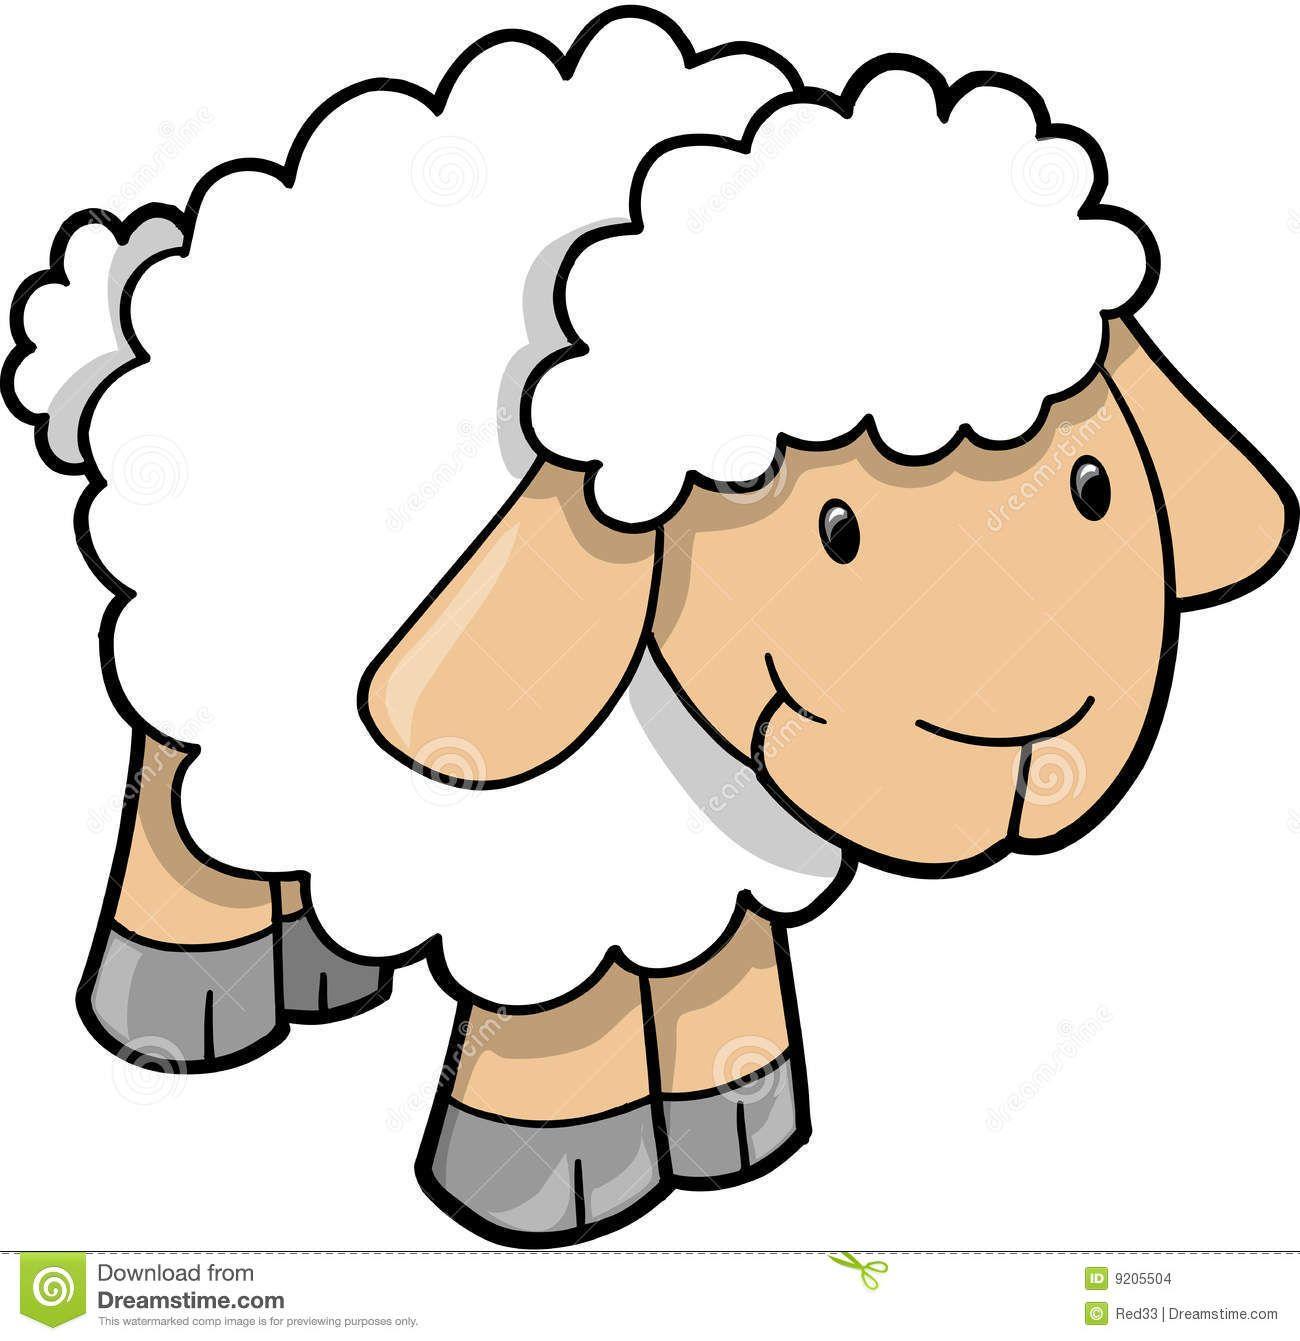 Sheep clipart images clip art transparent stock cute sheep images | Cute Sheep Lamb Vector Stock Images ... clip art transparent stock